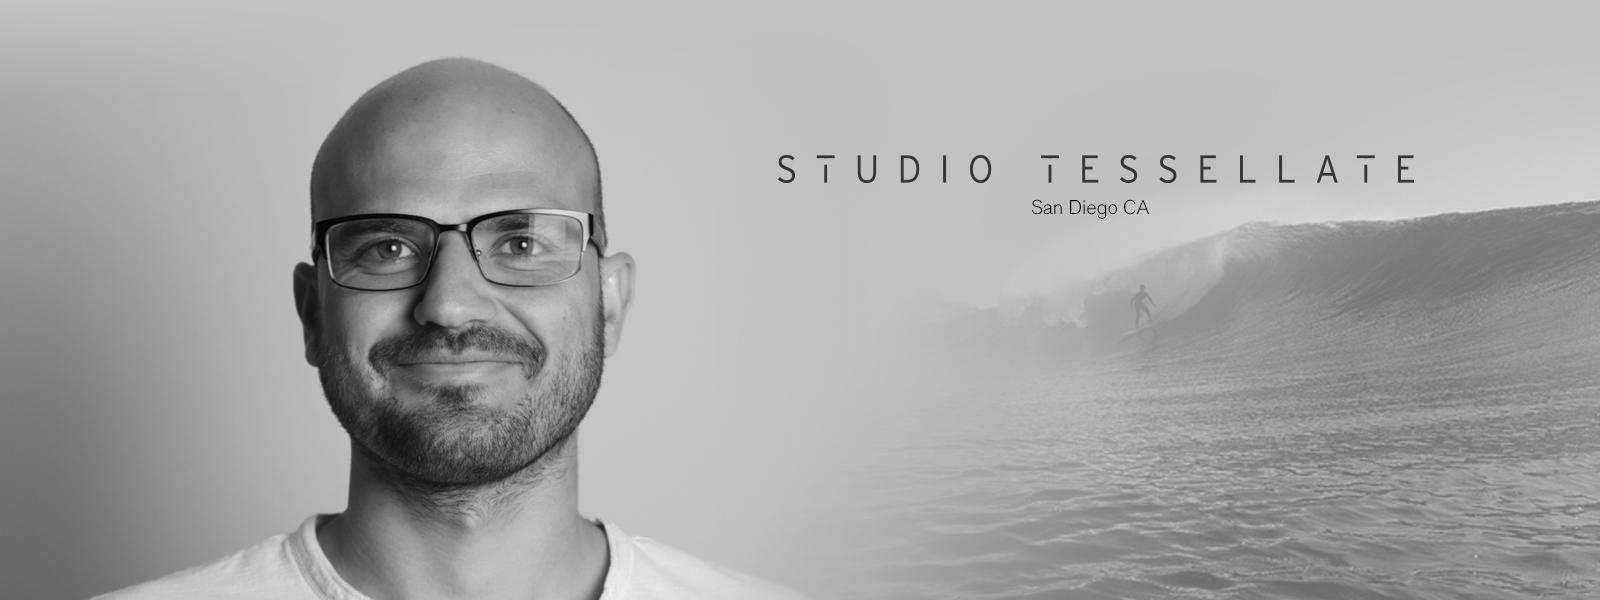 Jorge Contreras Studio Tessellate San Diego California Motion Graphics